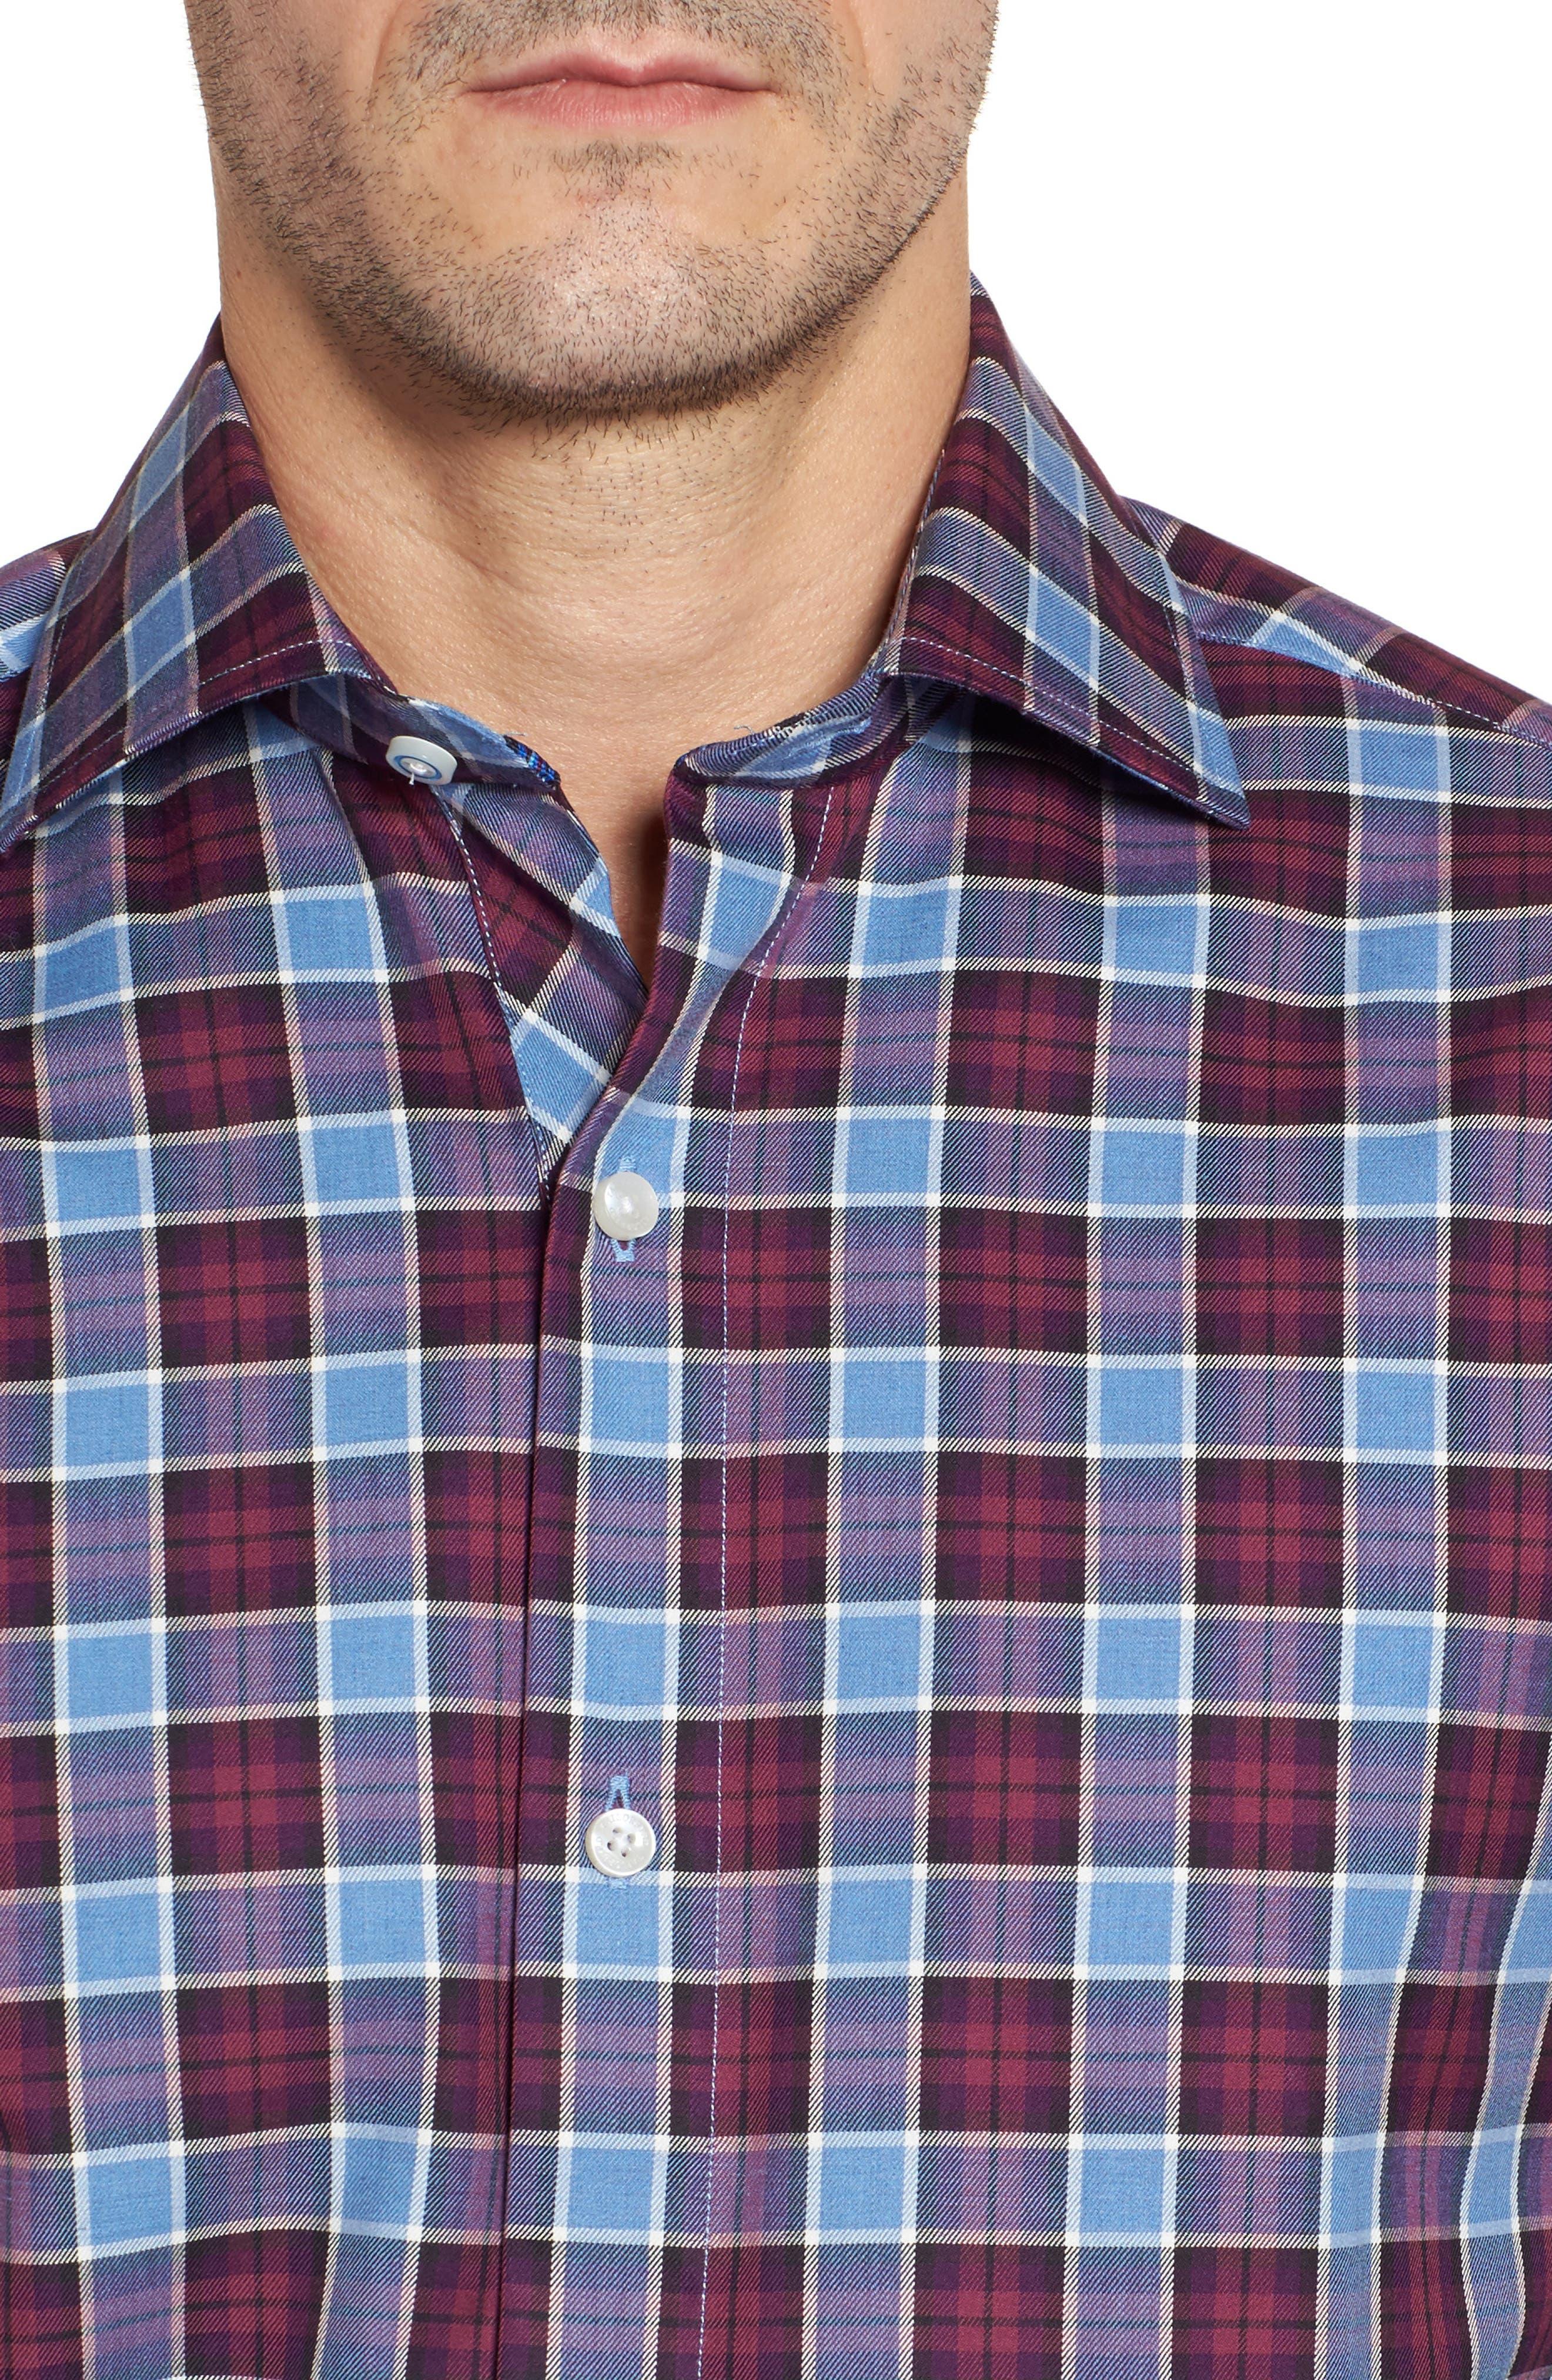 Campti Regular Fit Plaid Sport Shirt,                             Alternate thumbnail 4, color,                             Purple